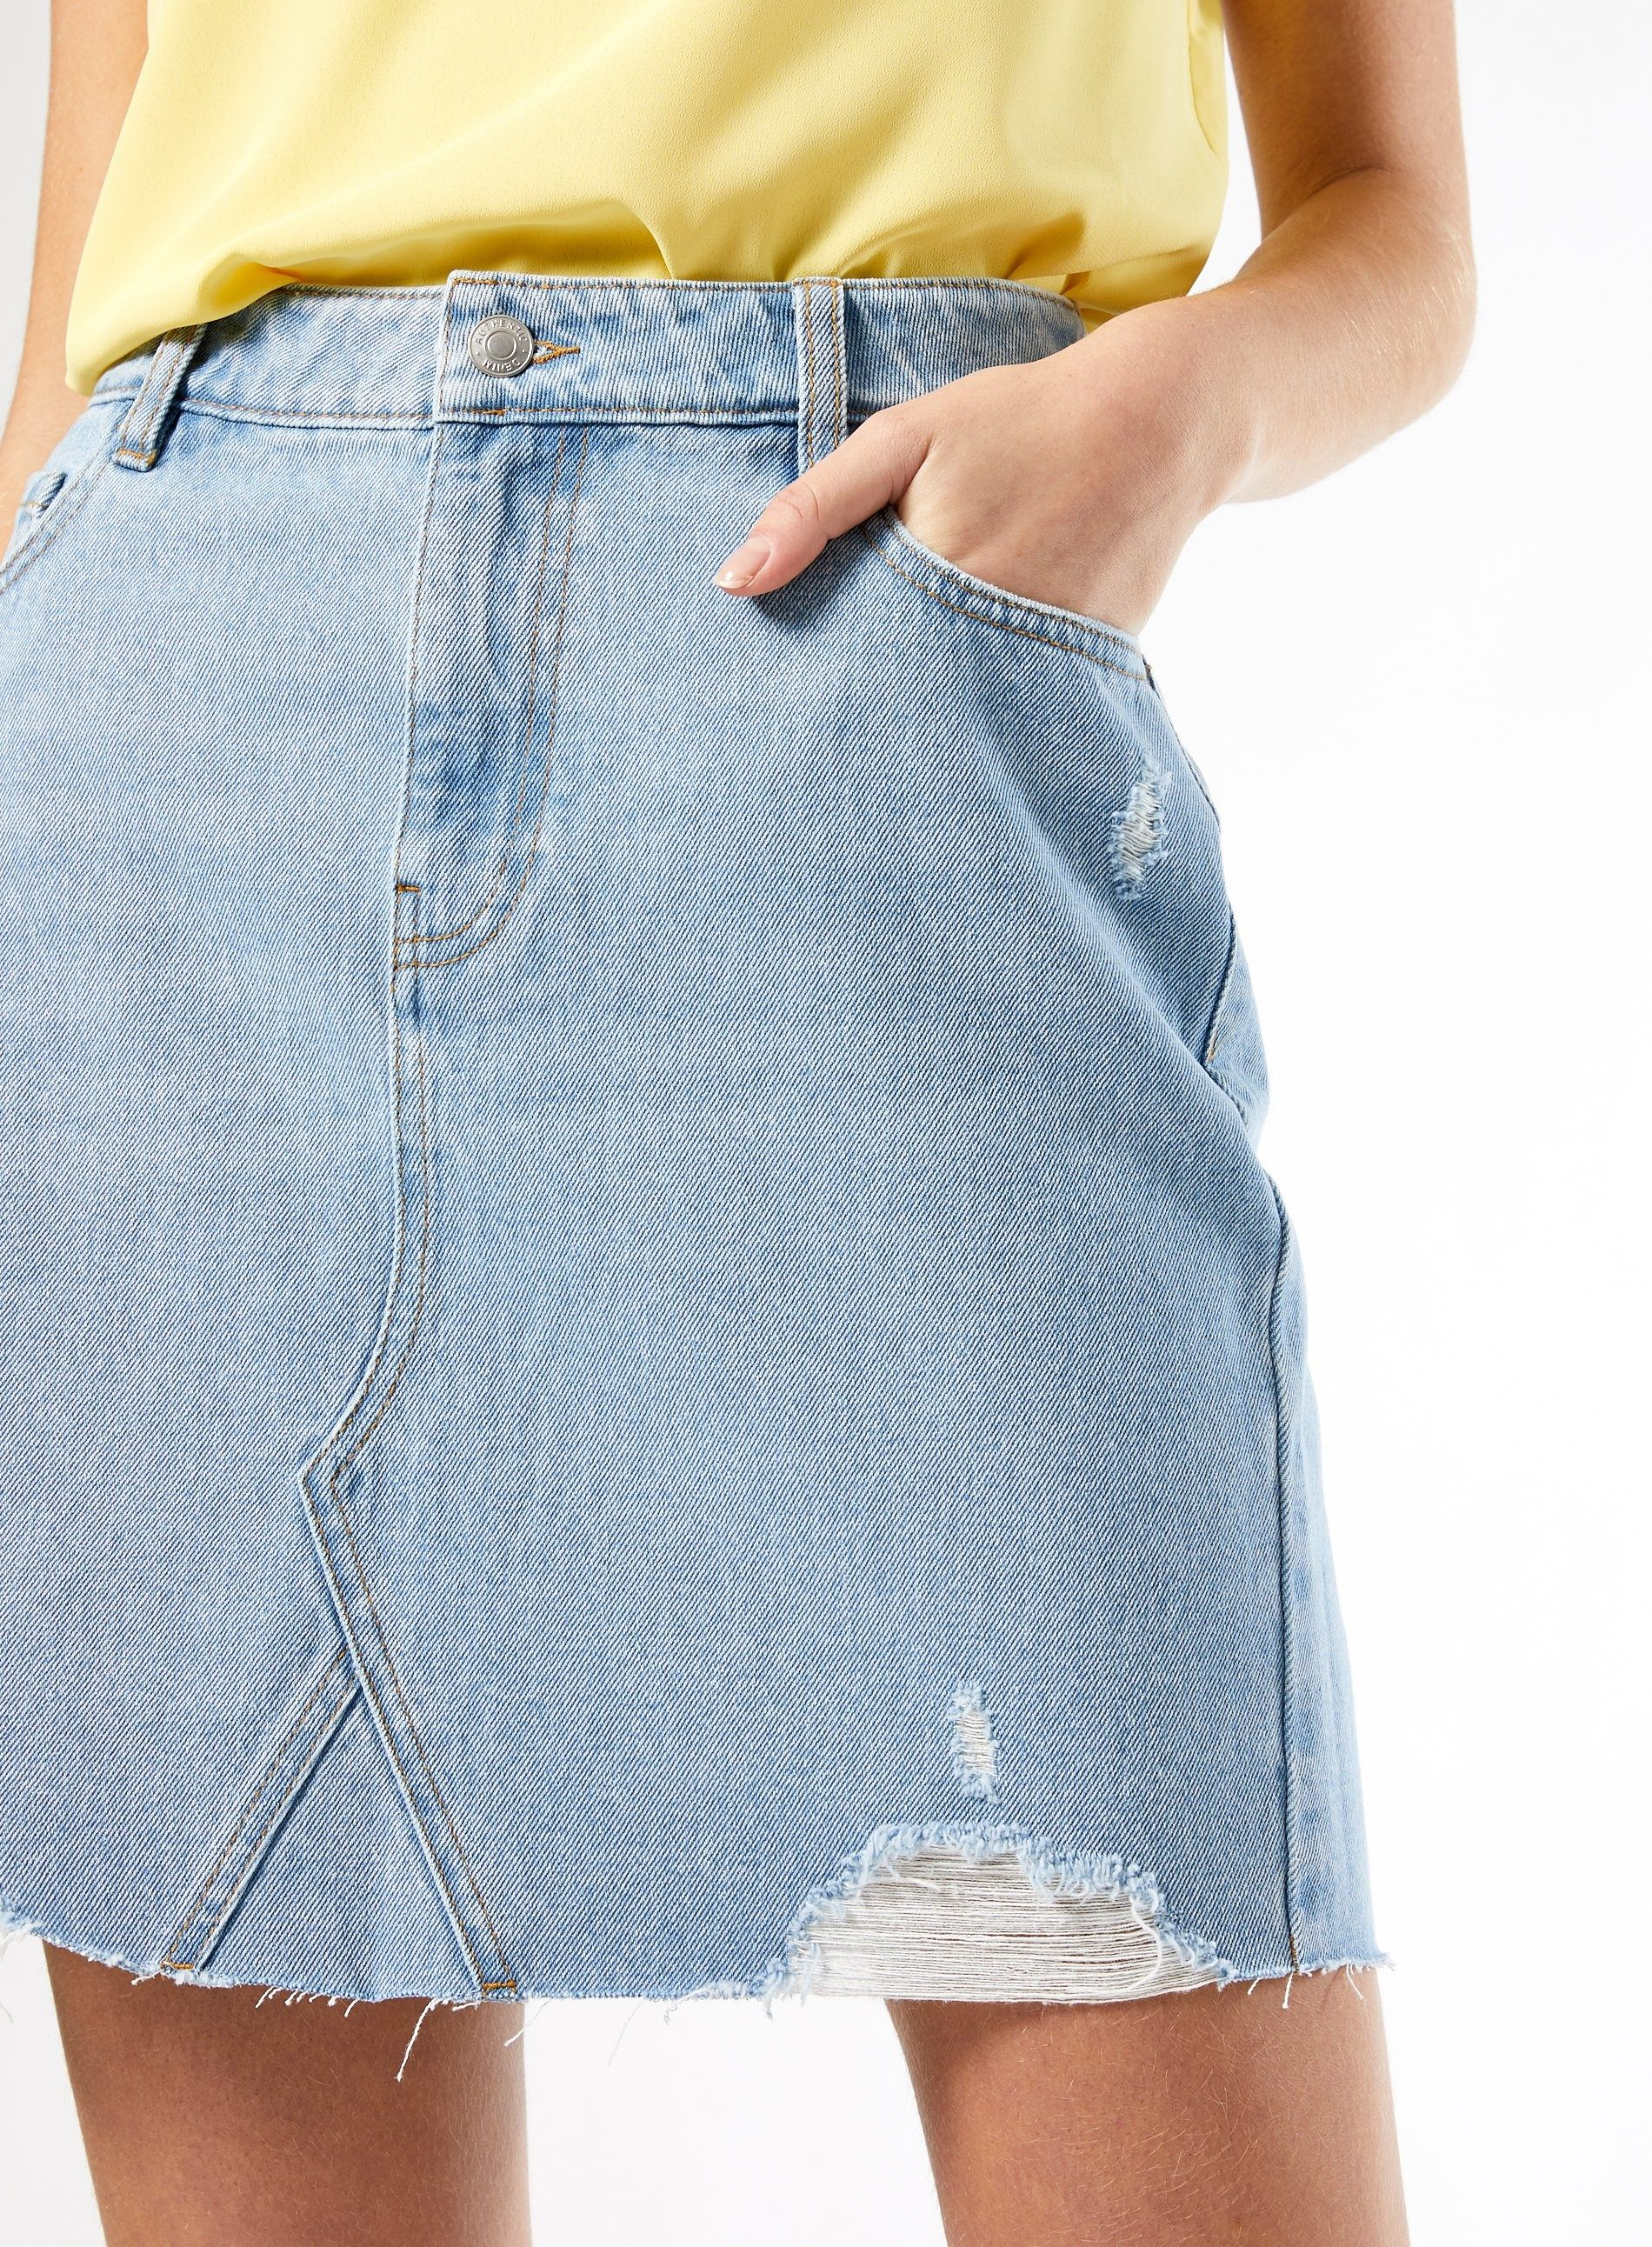 Dorothy Perkins Womens Blue Bleach Cotton Ripped Denim Mini Skirt Pockets